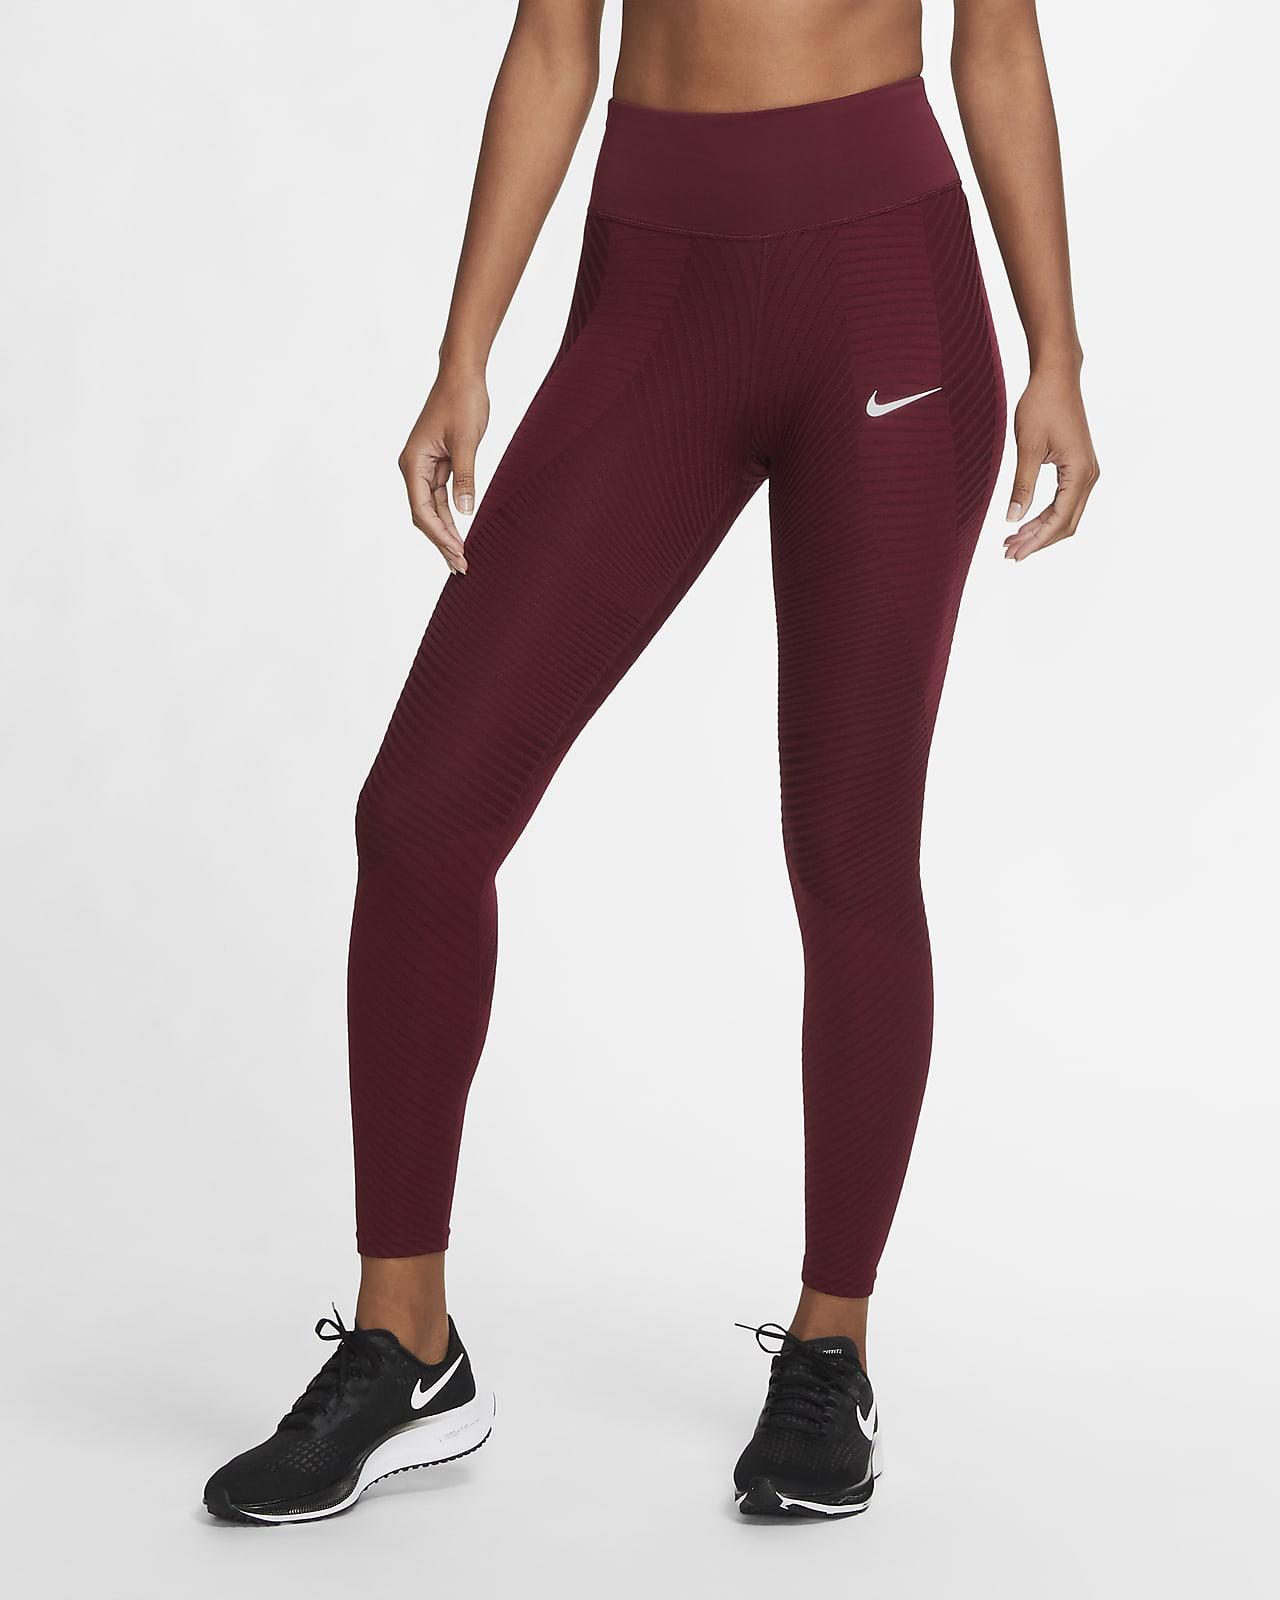 Leggings de running texturizados para mujer Nike Epic Luxe